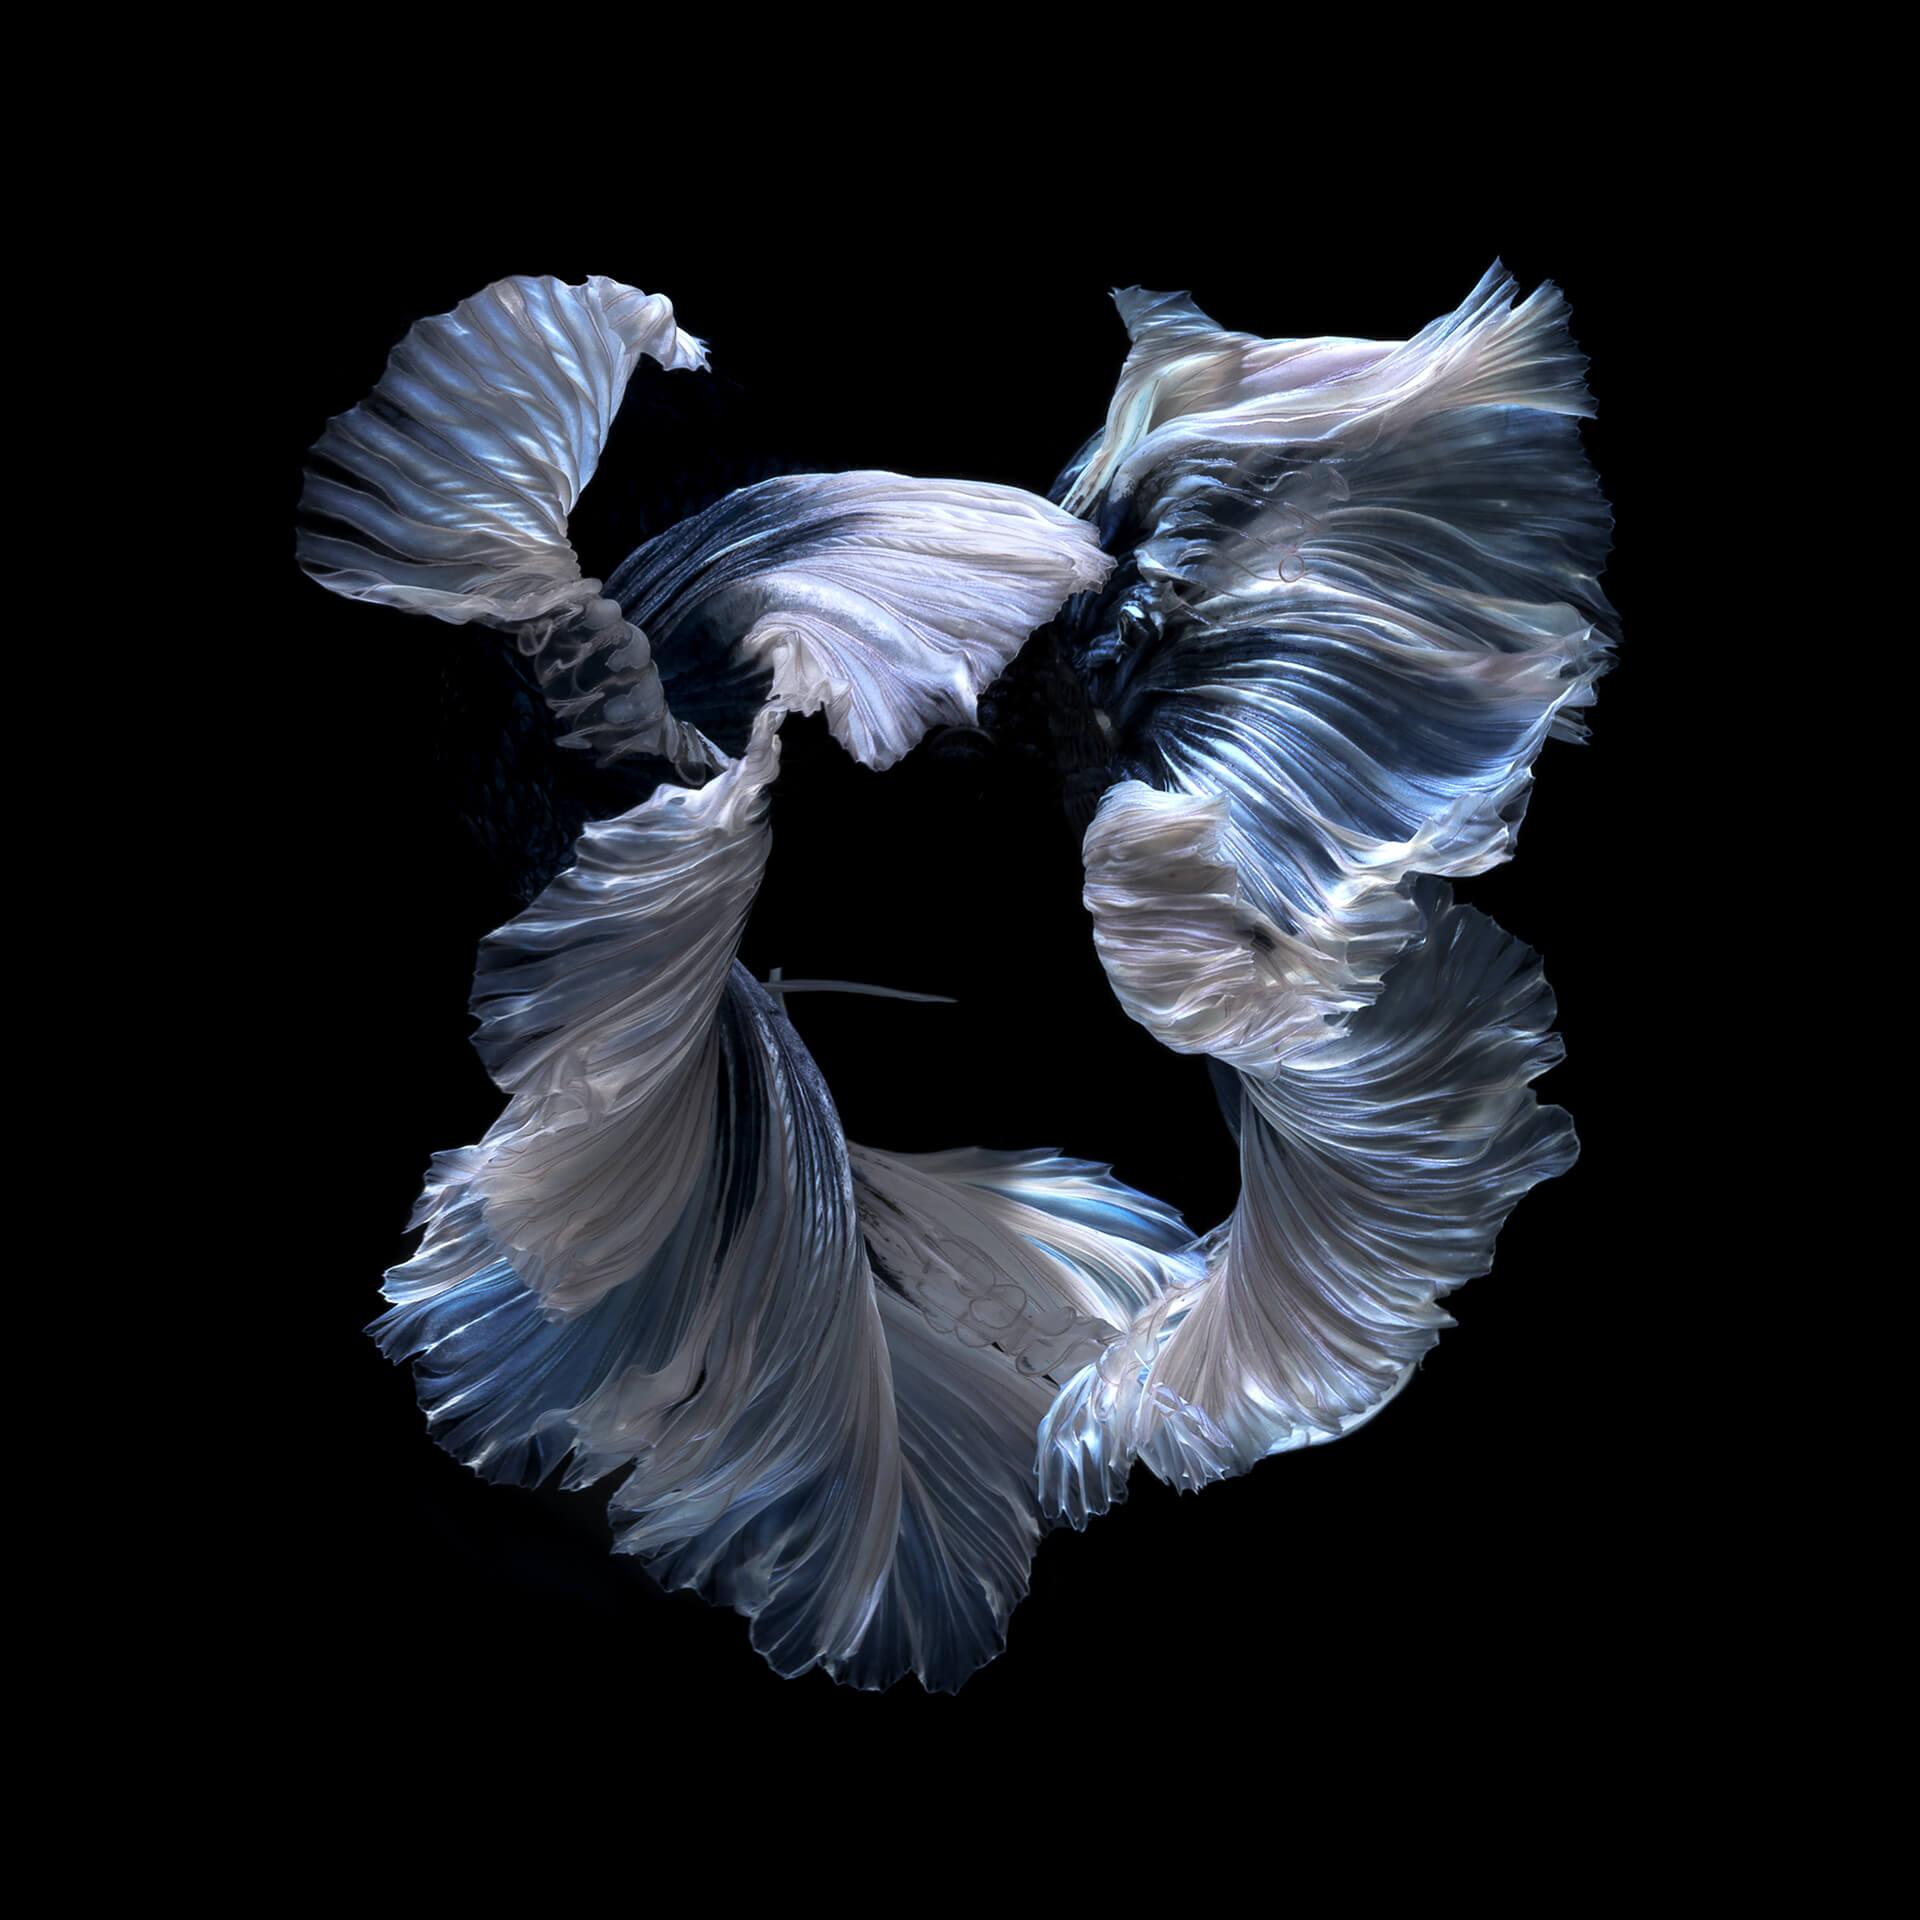 interview with visarute angkatavanich siamese fighting fish betta fish fight fantail betta crowntail betta fish